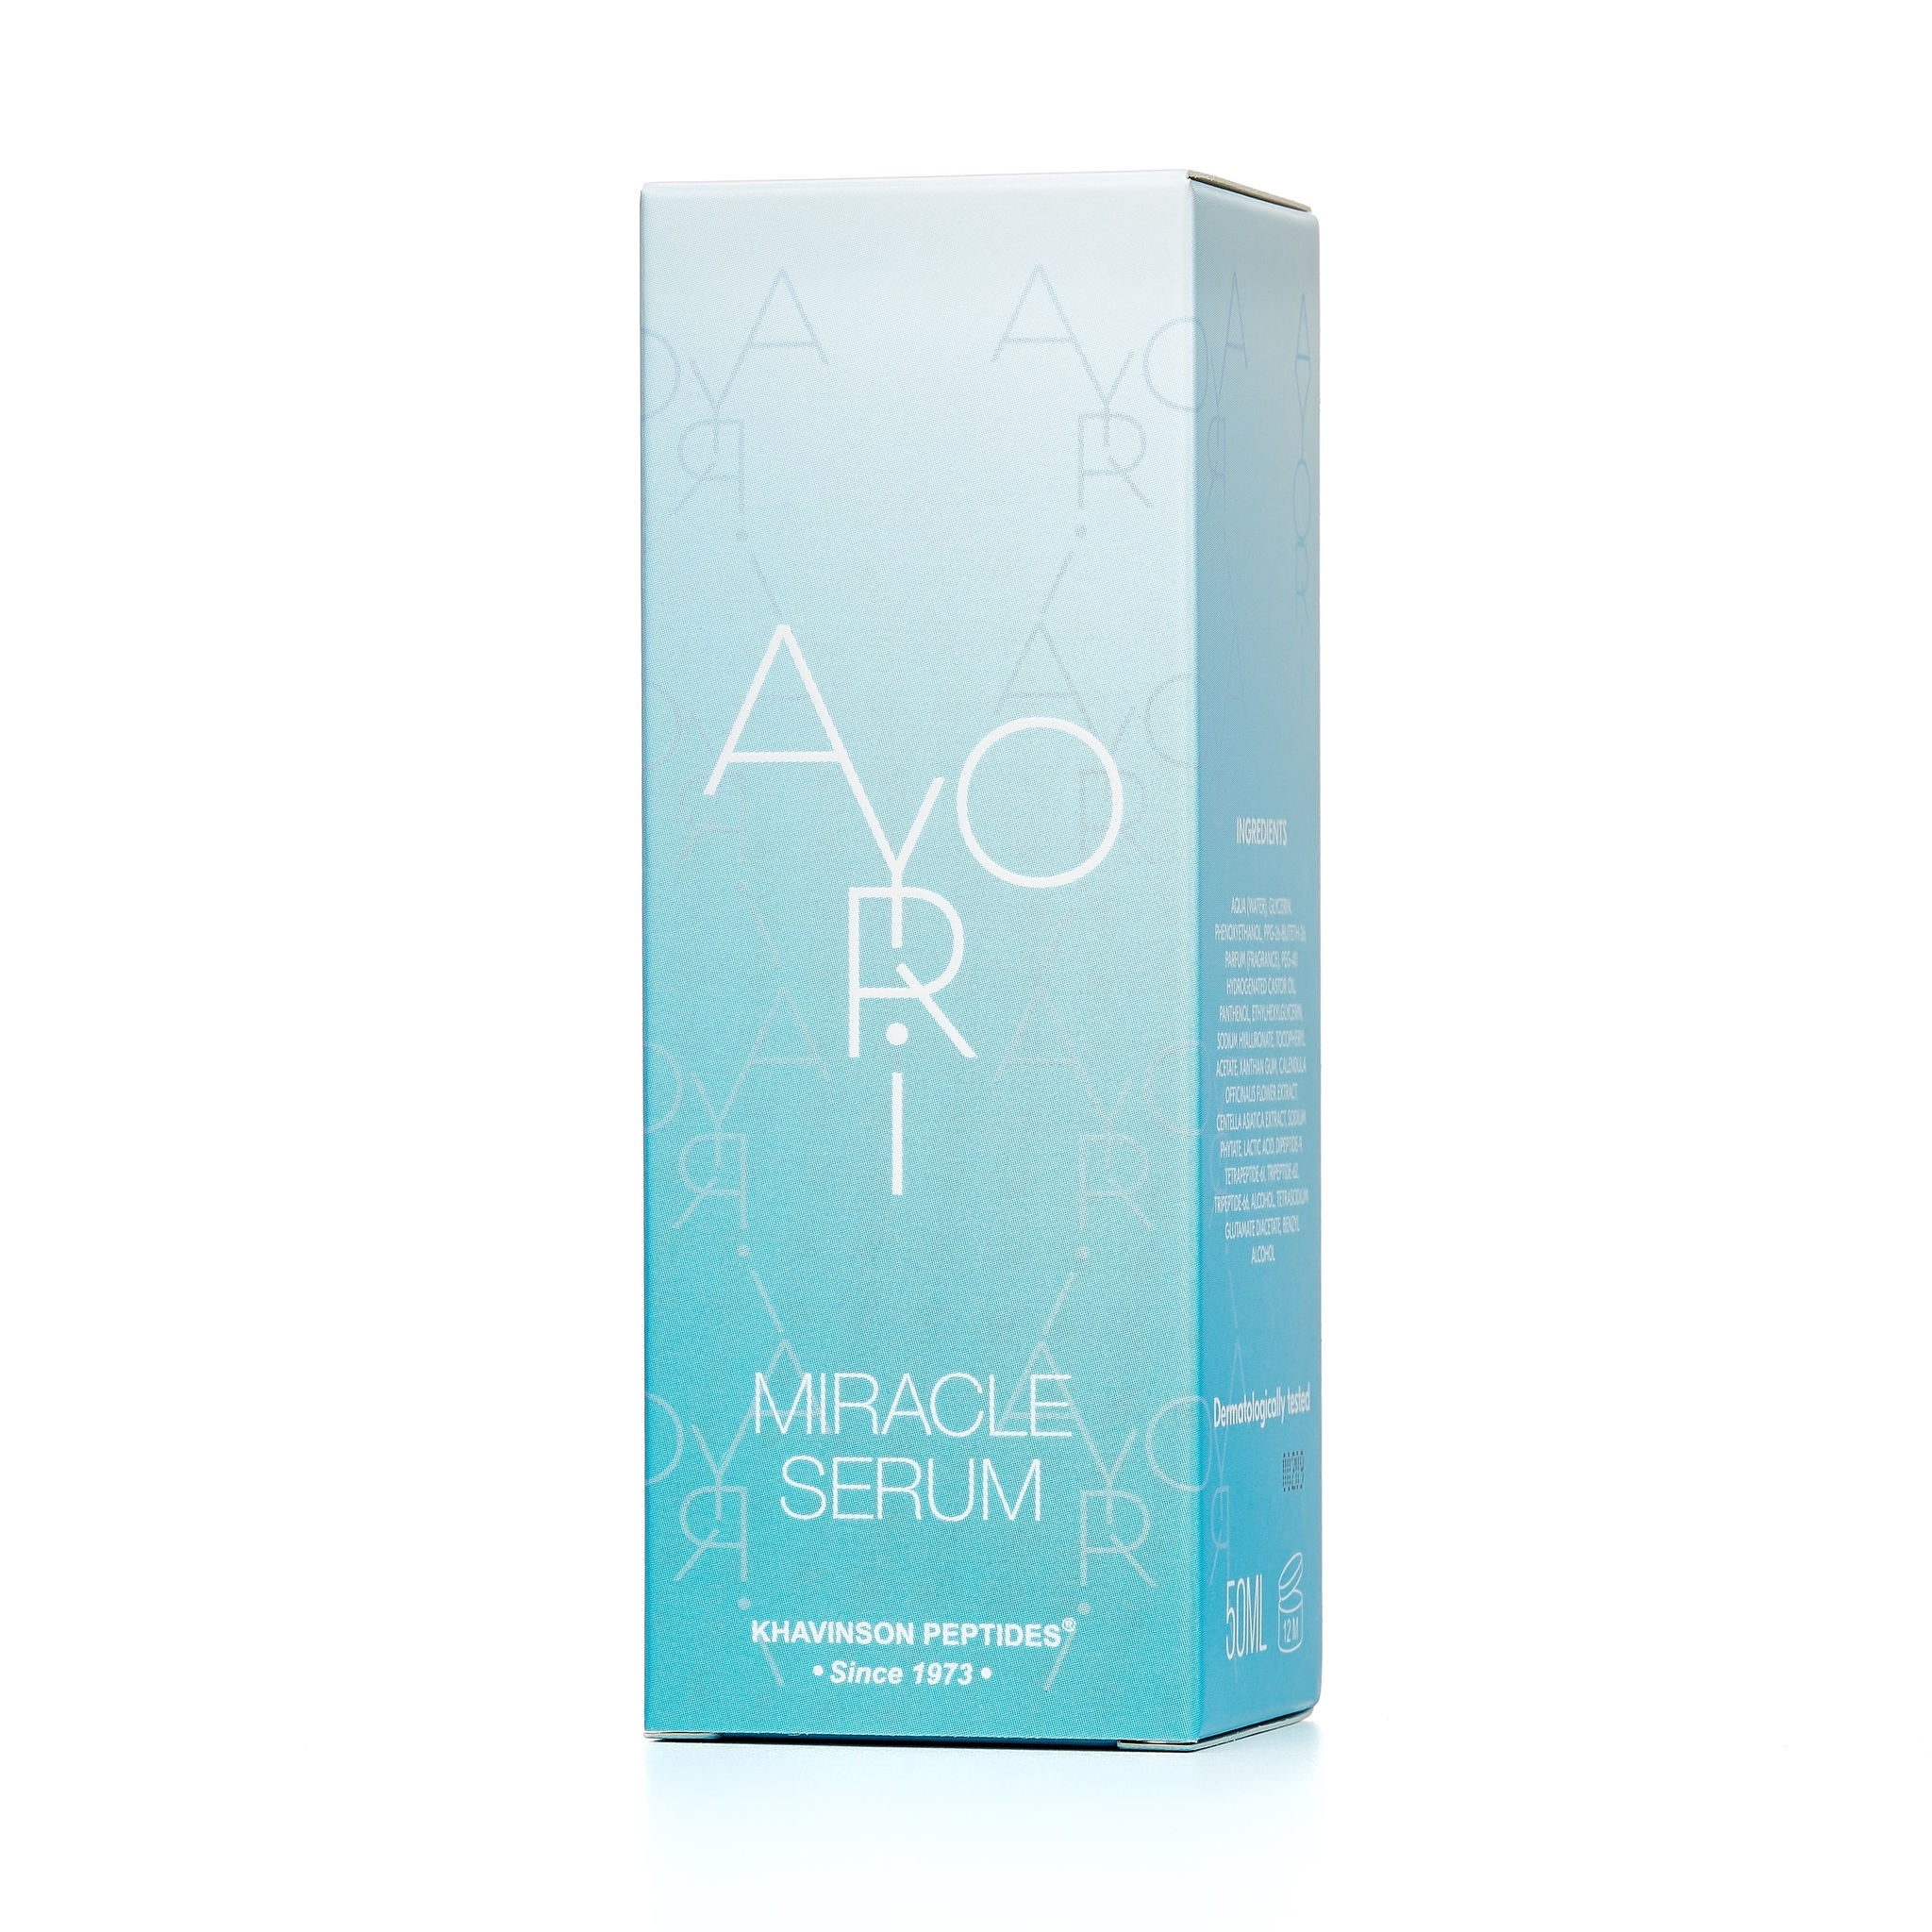 AYORI, Сыворотка Miracle Serum - для ухода за кожей, 50 мл